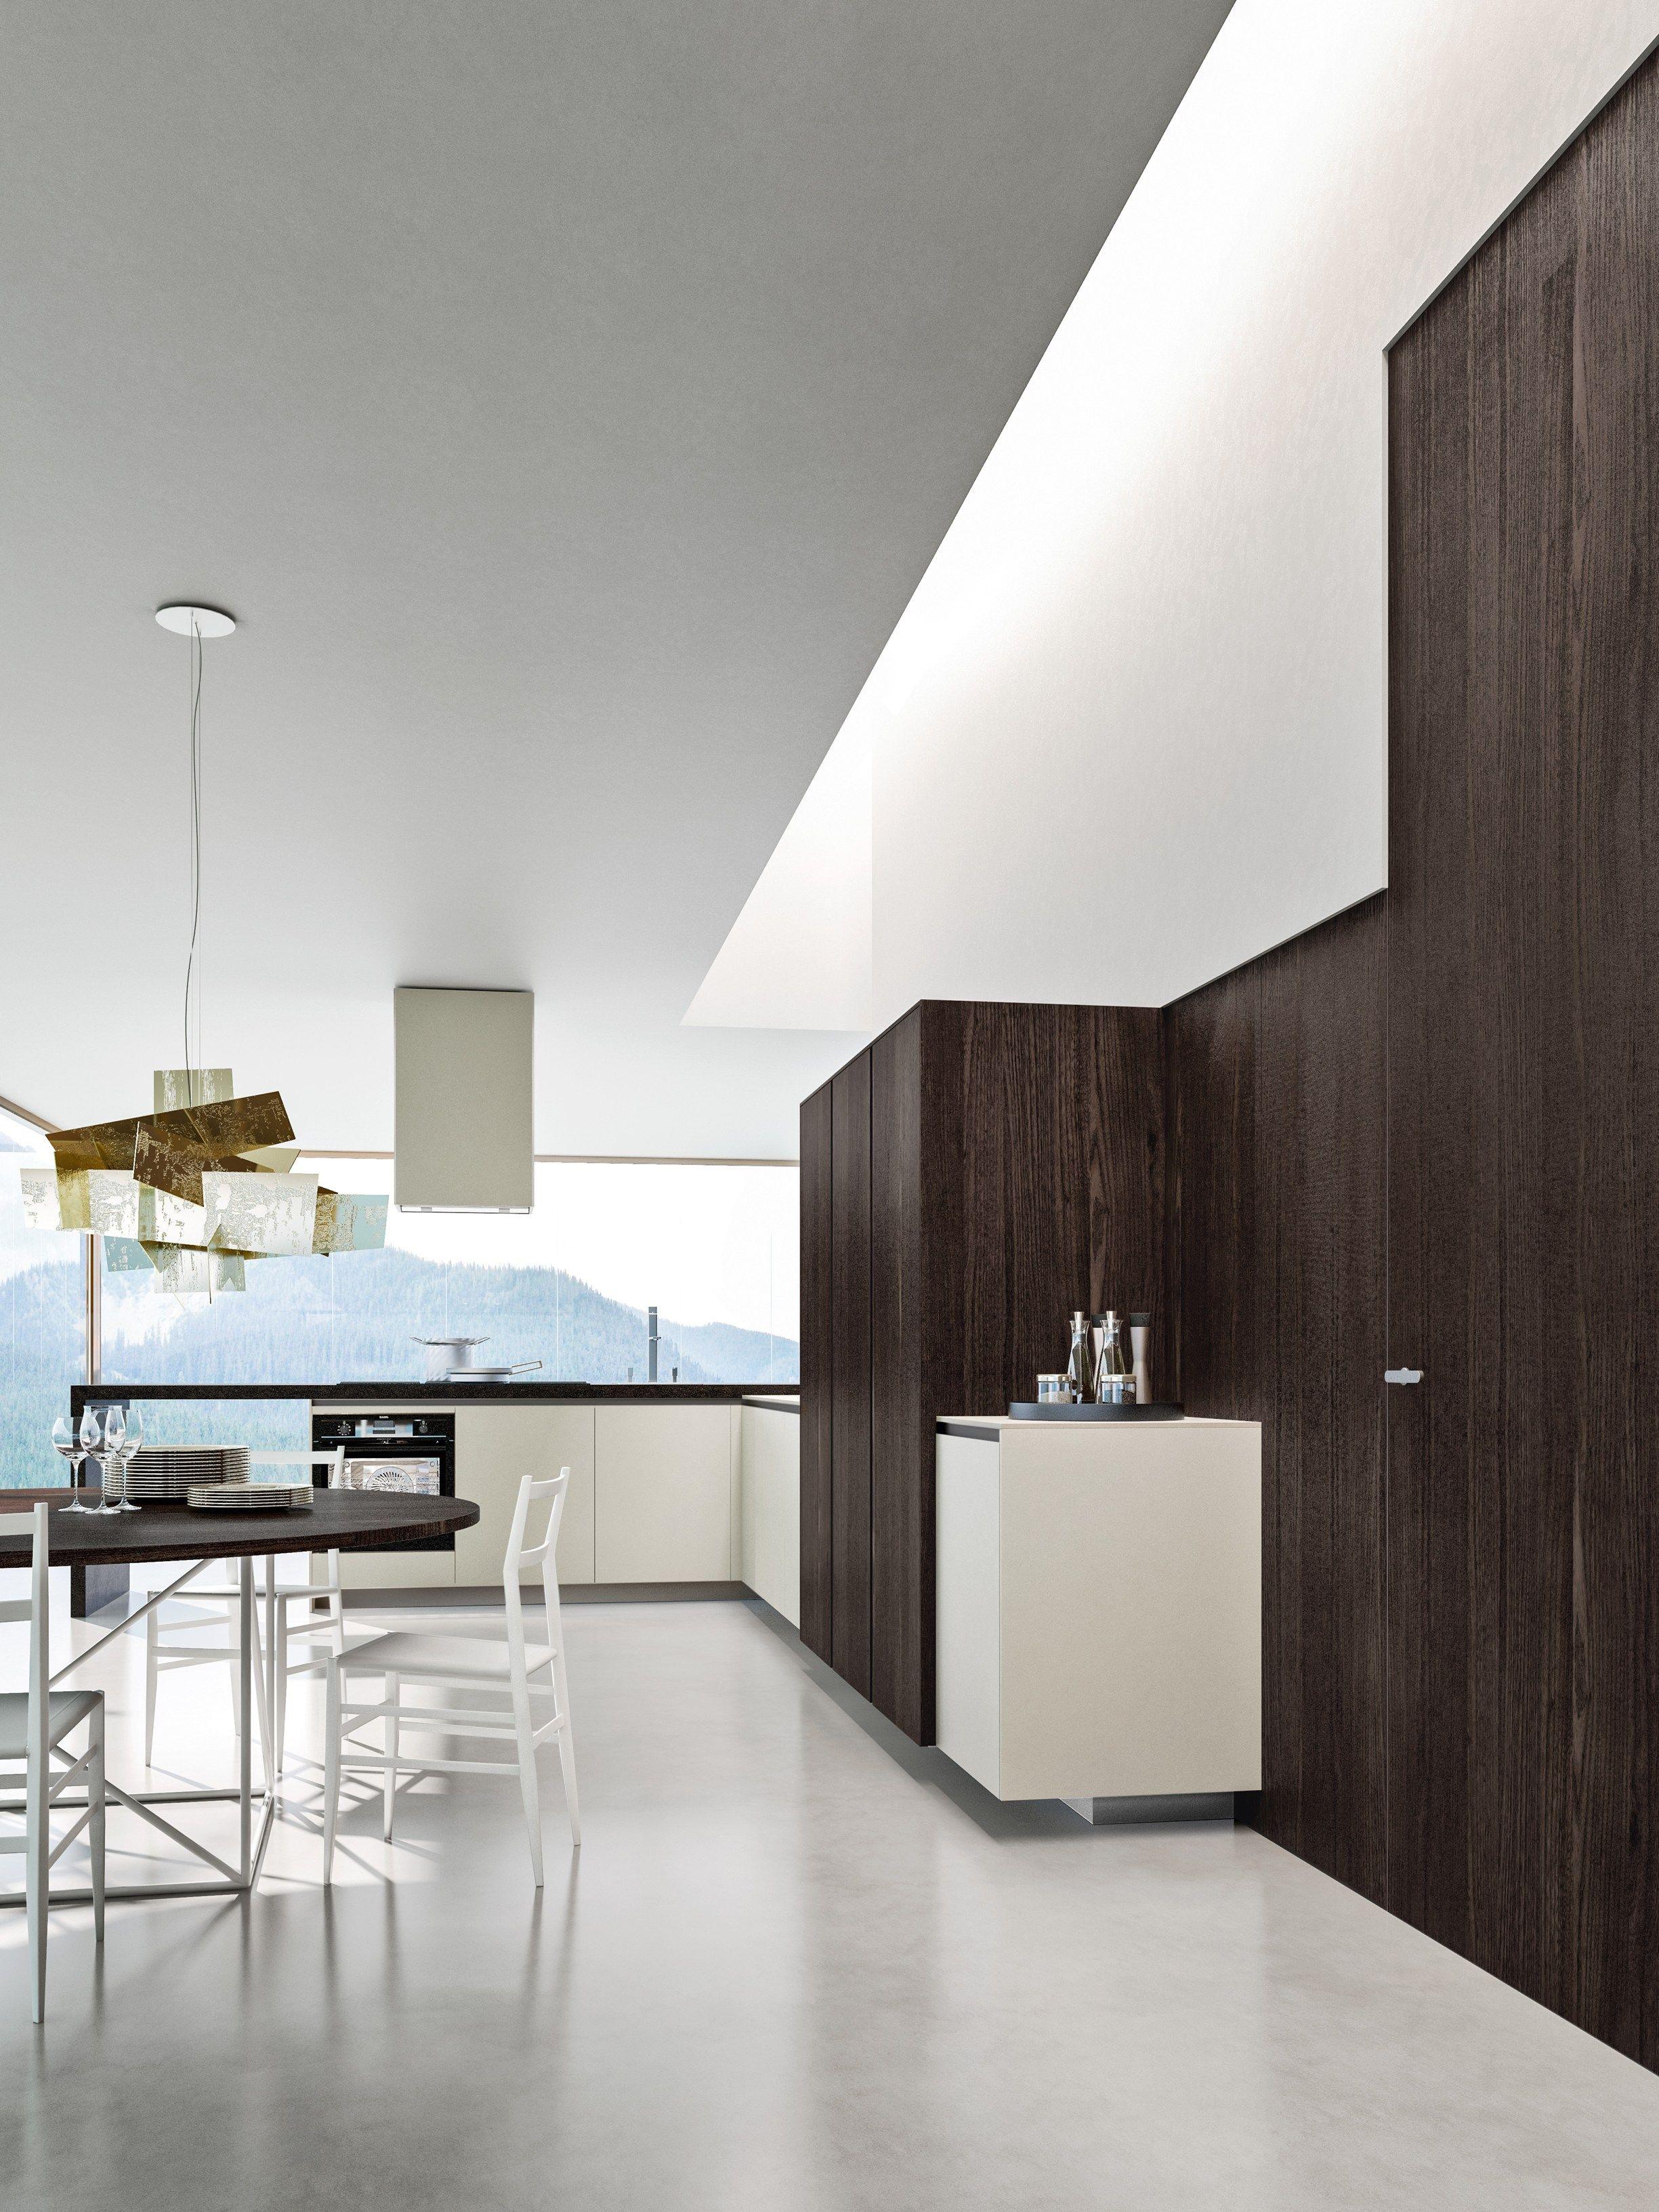 WAY Küche mit Halbinsel Kollektion SISTEMA by Snaidero Design Snaidero